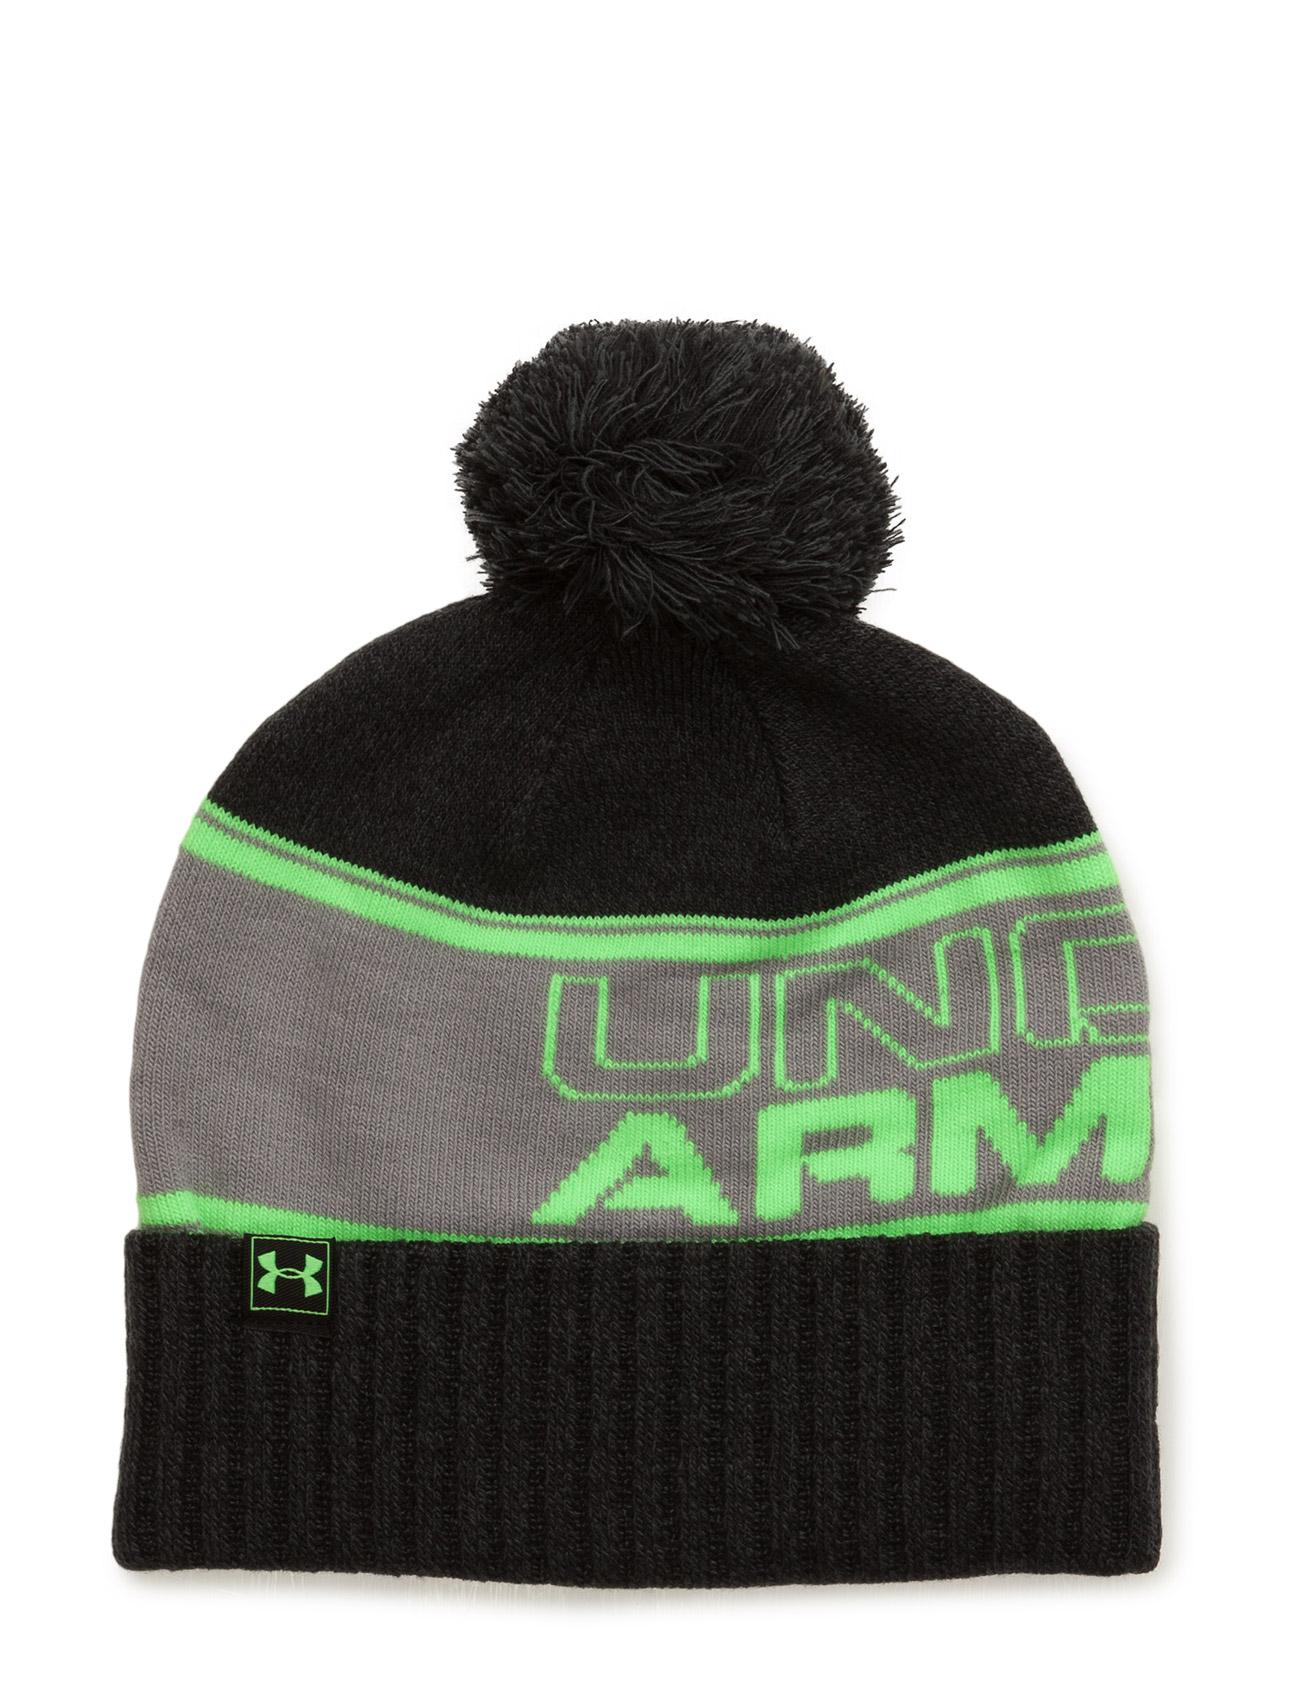 Men'S Ua Pom Beanie Under Armour Sports accessories til Mænd i Rød